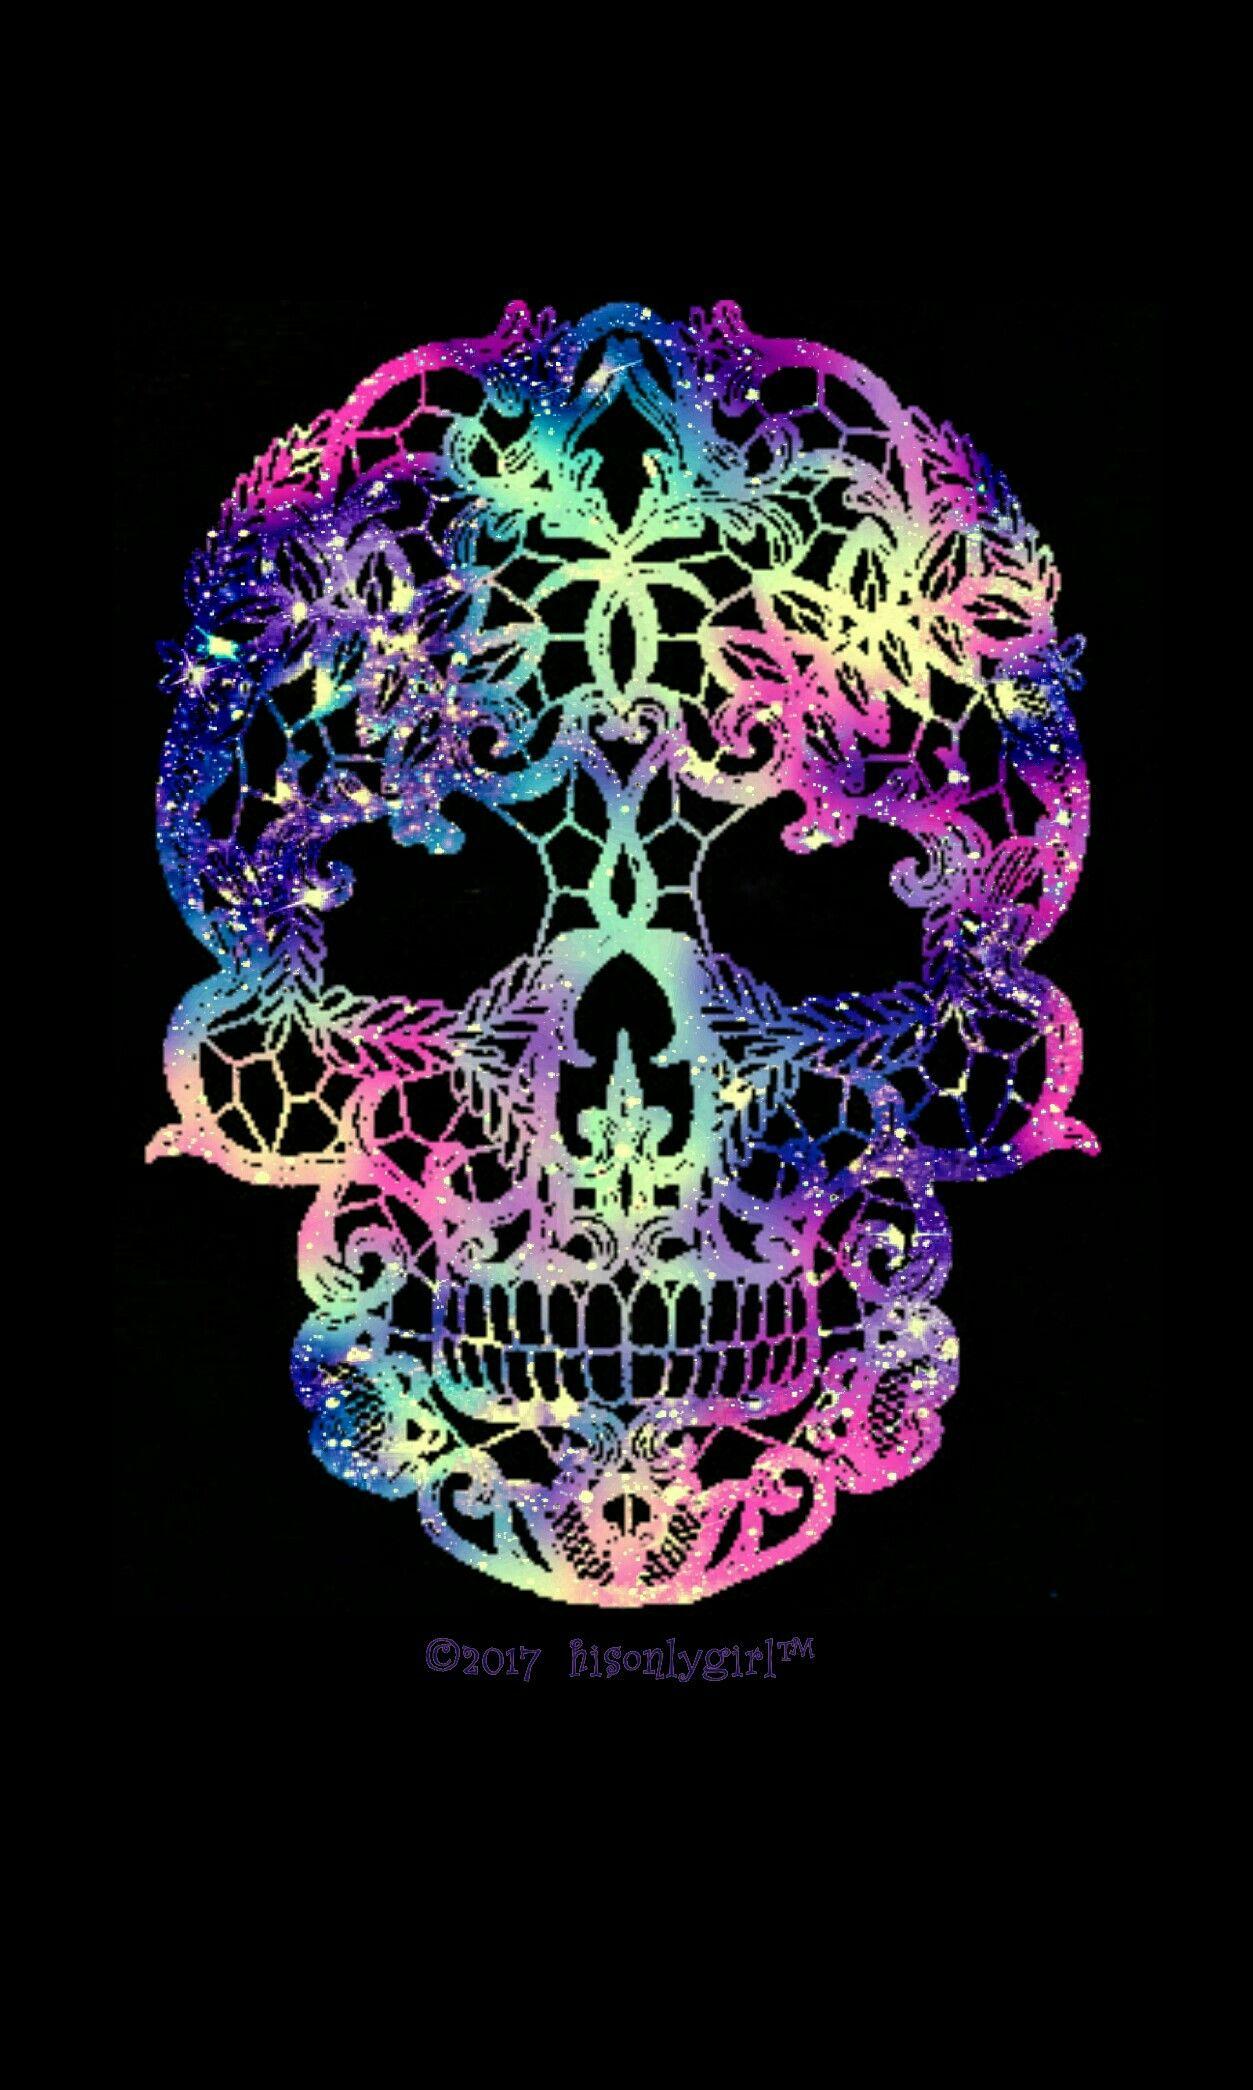 Girly Skull Galaxy Wallpaper I Created For The App Cocoppa Skull Wallpaper Pink Skull Wallpaper Skull Artwork